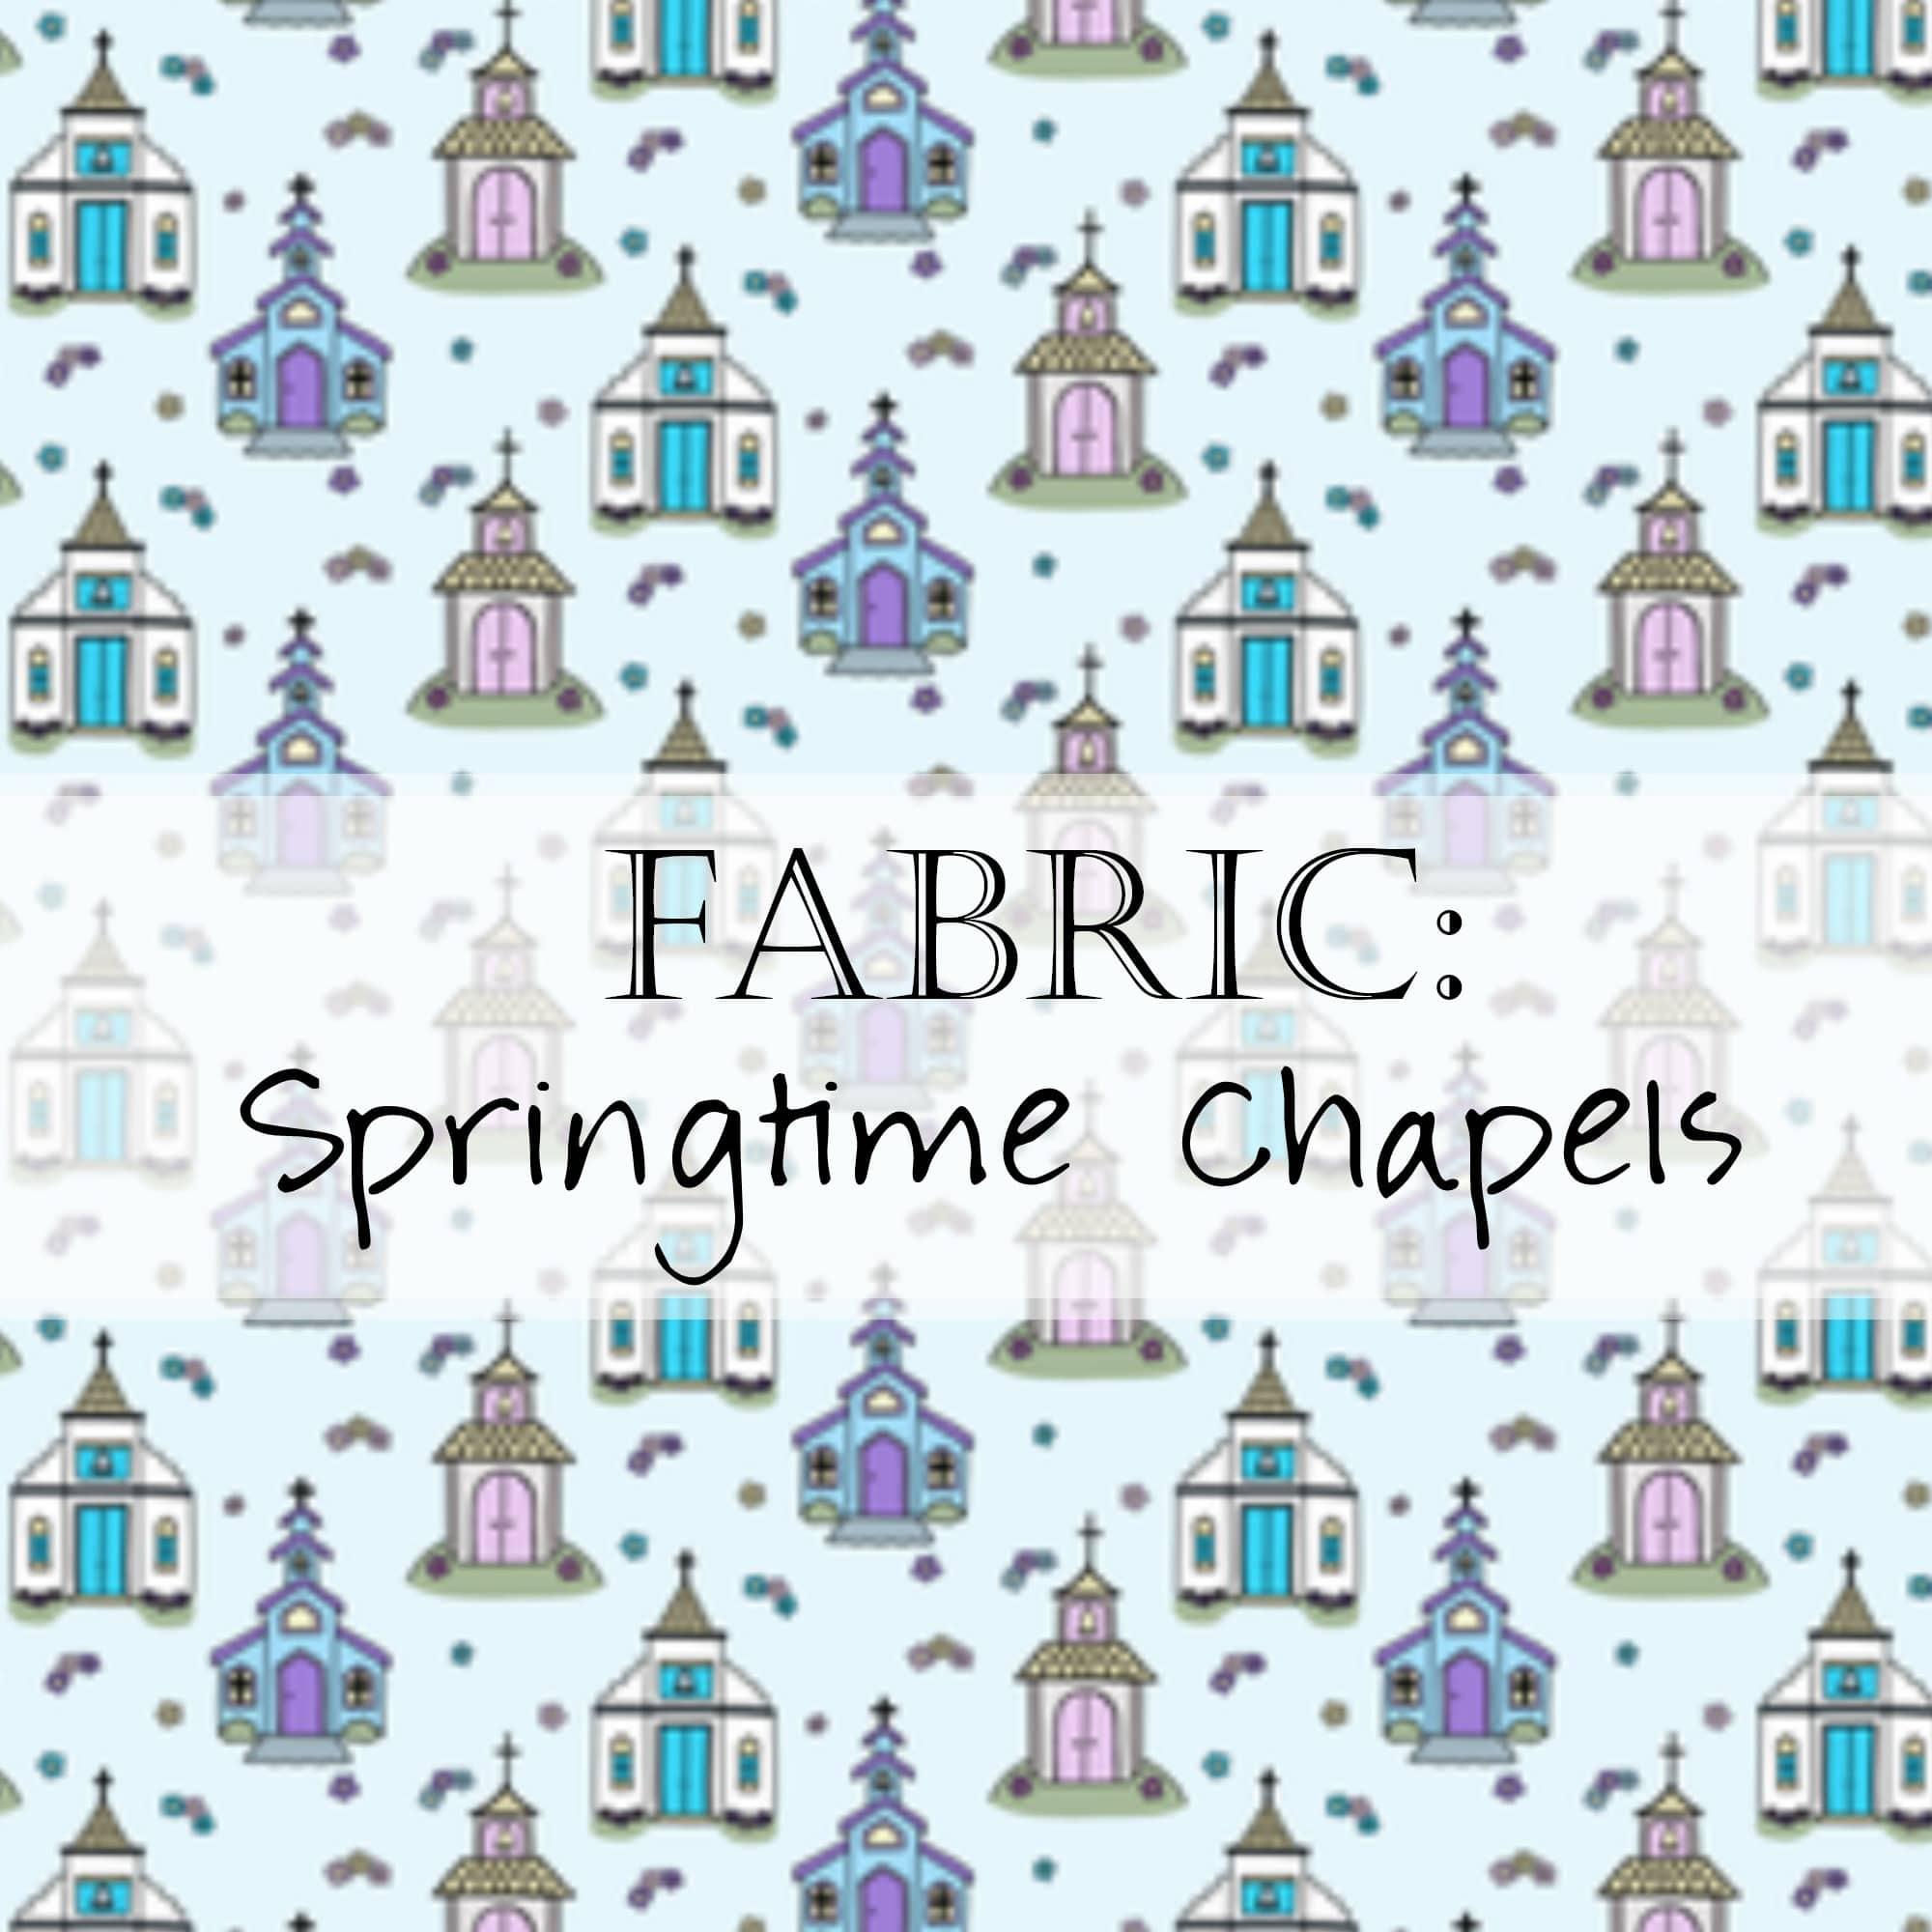 Fabric: Springtime Chapels